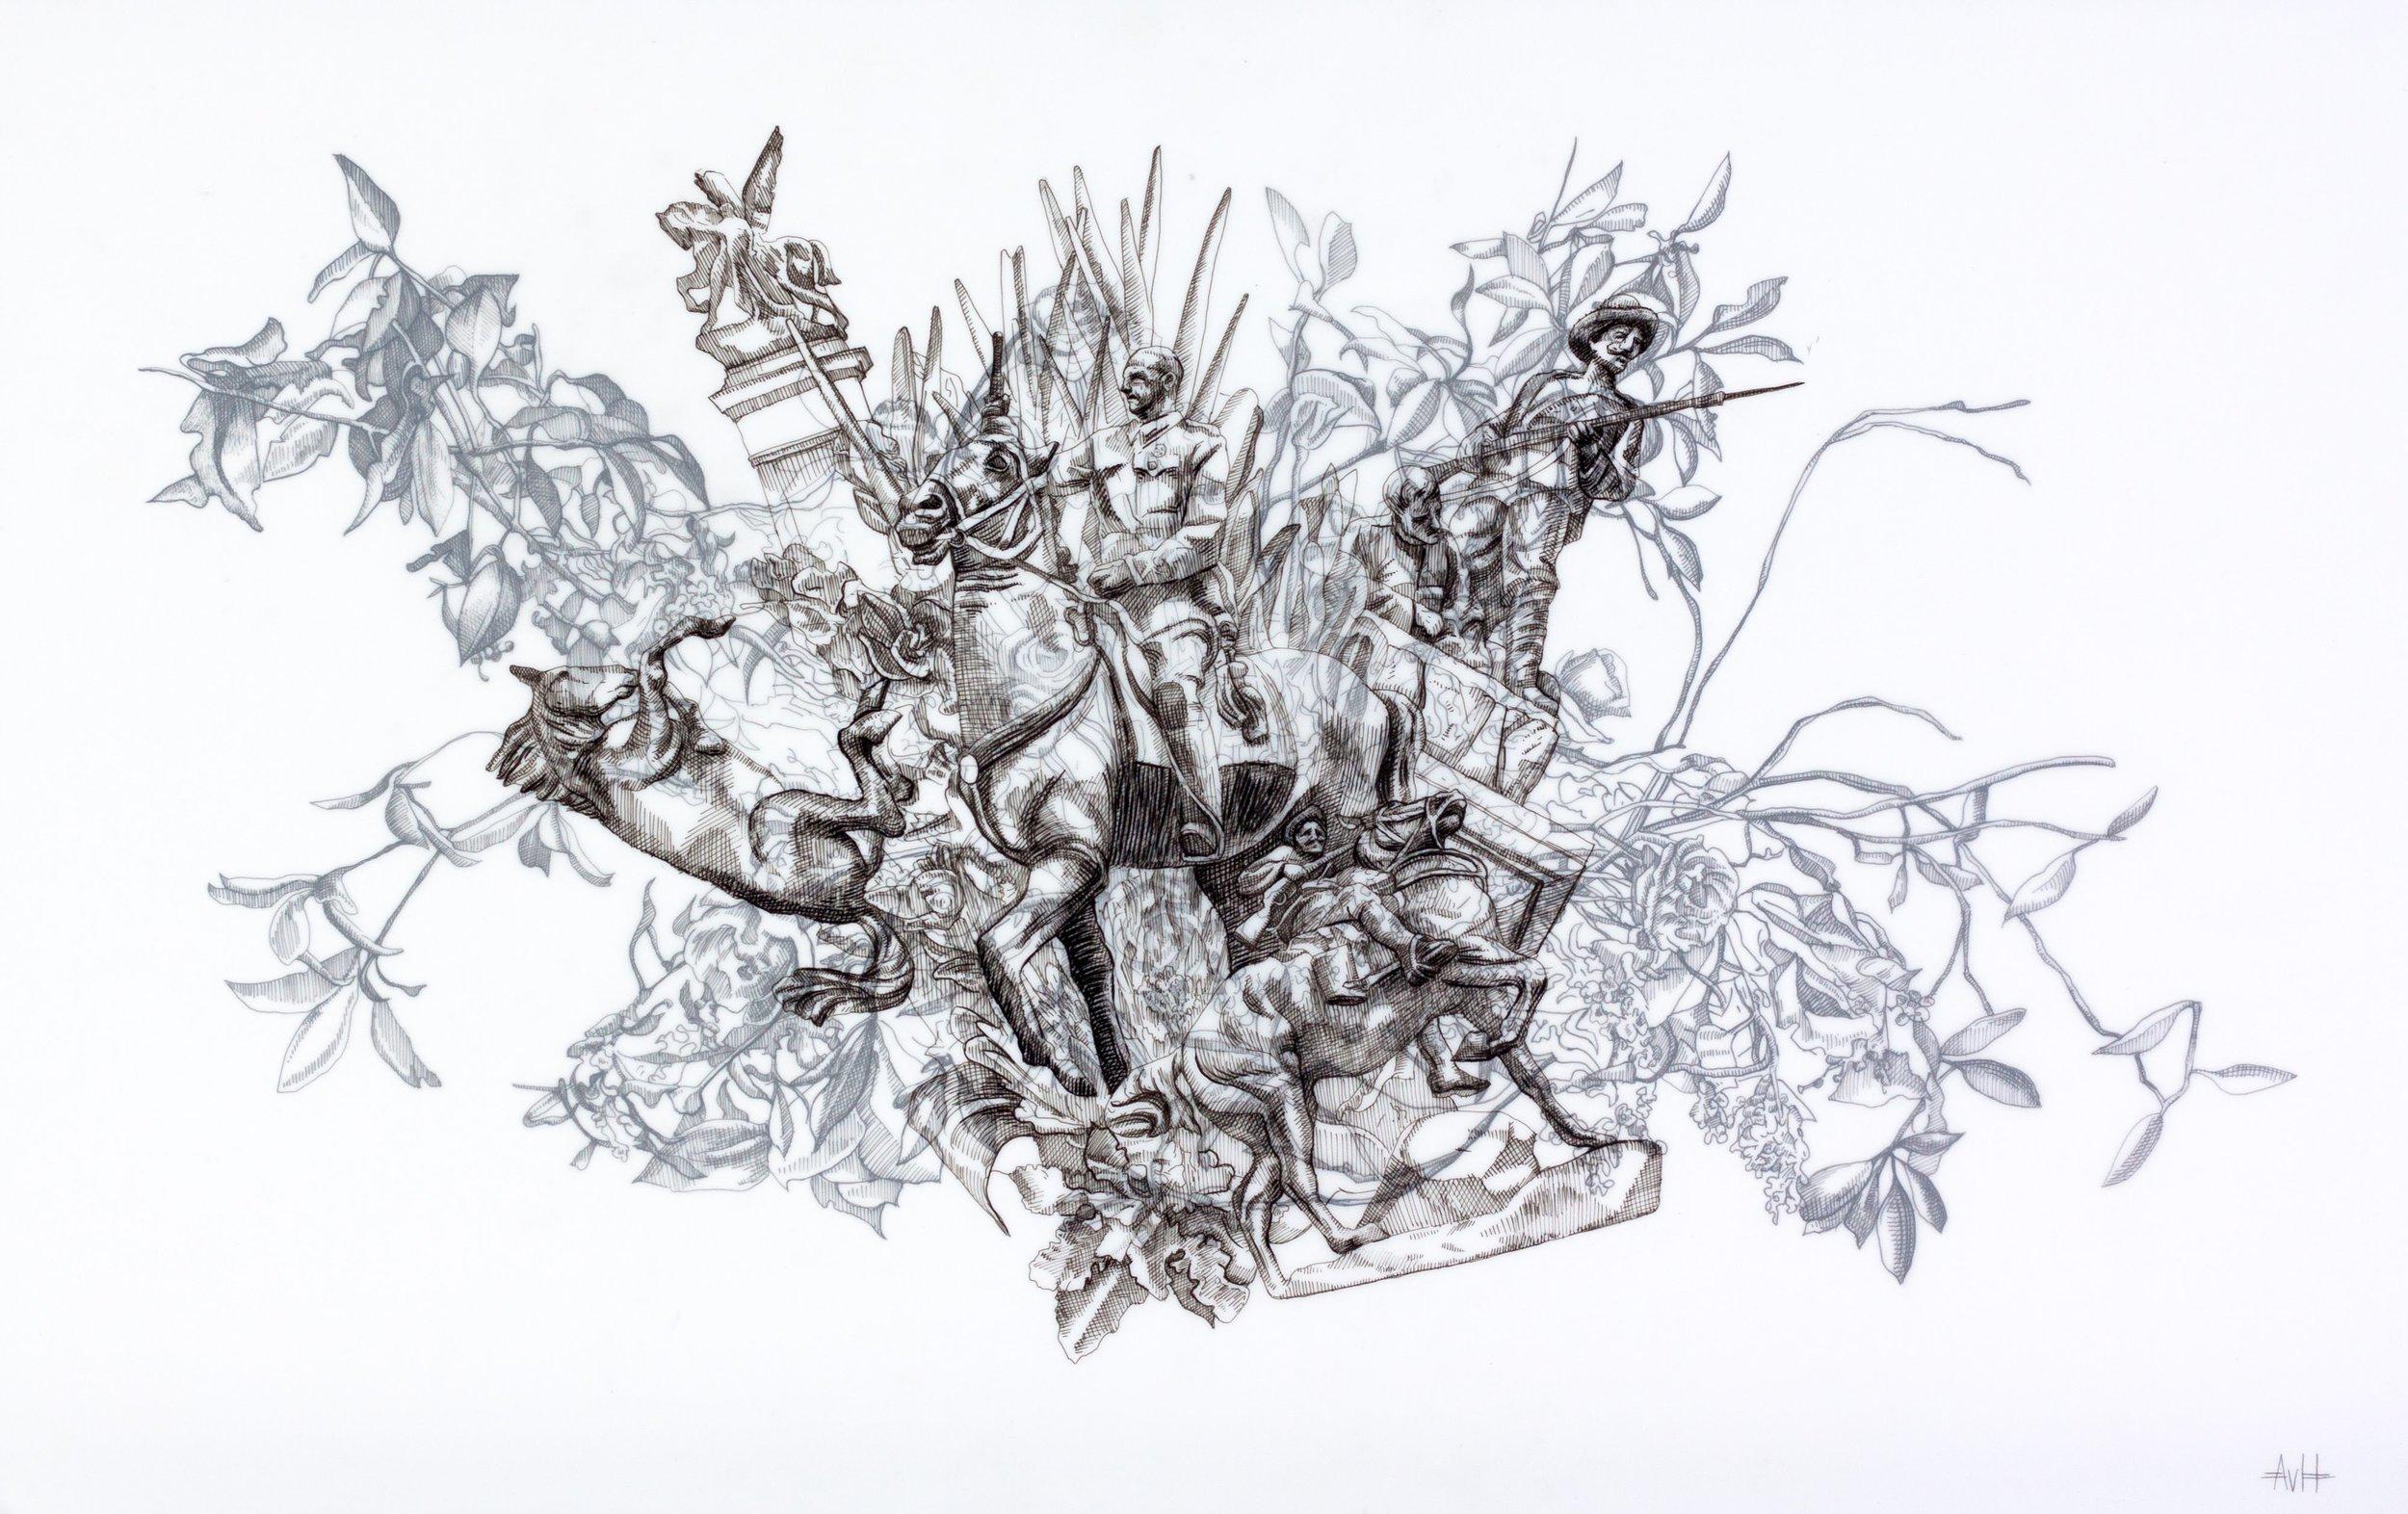 Effigy, Ink on Drafting Film, 37.5 x 59 cm